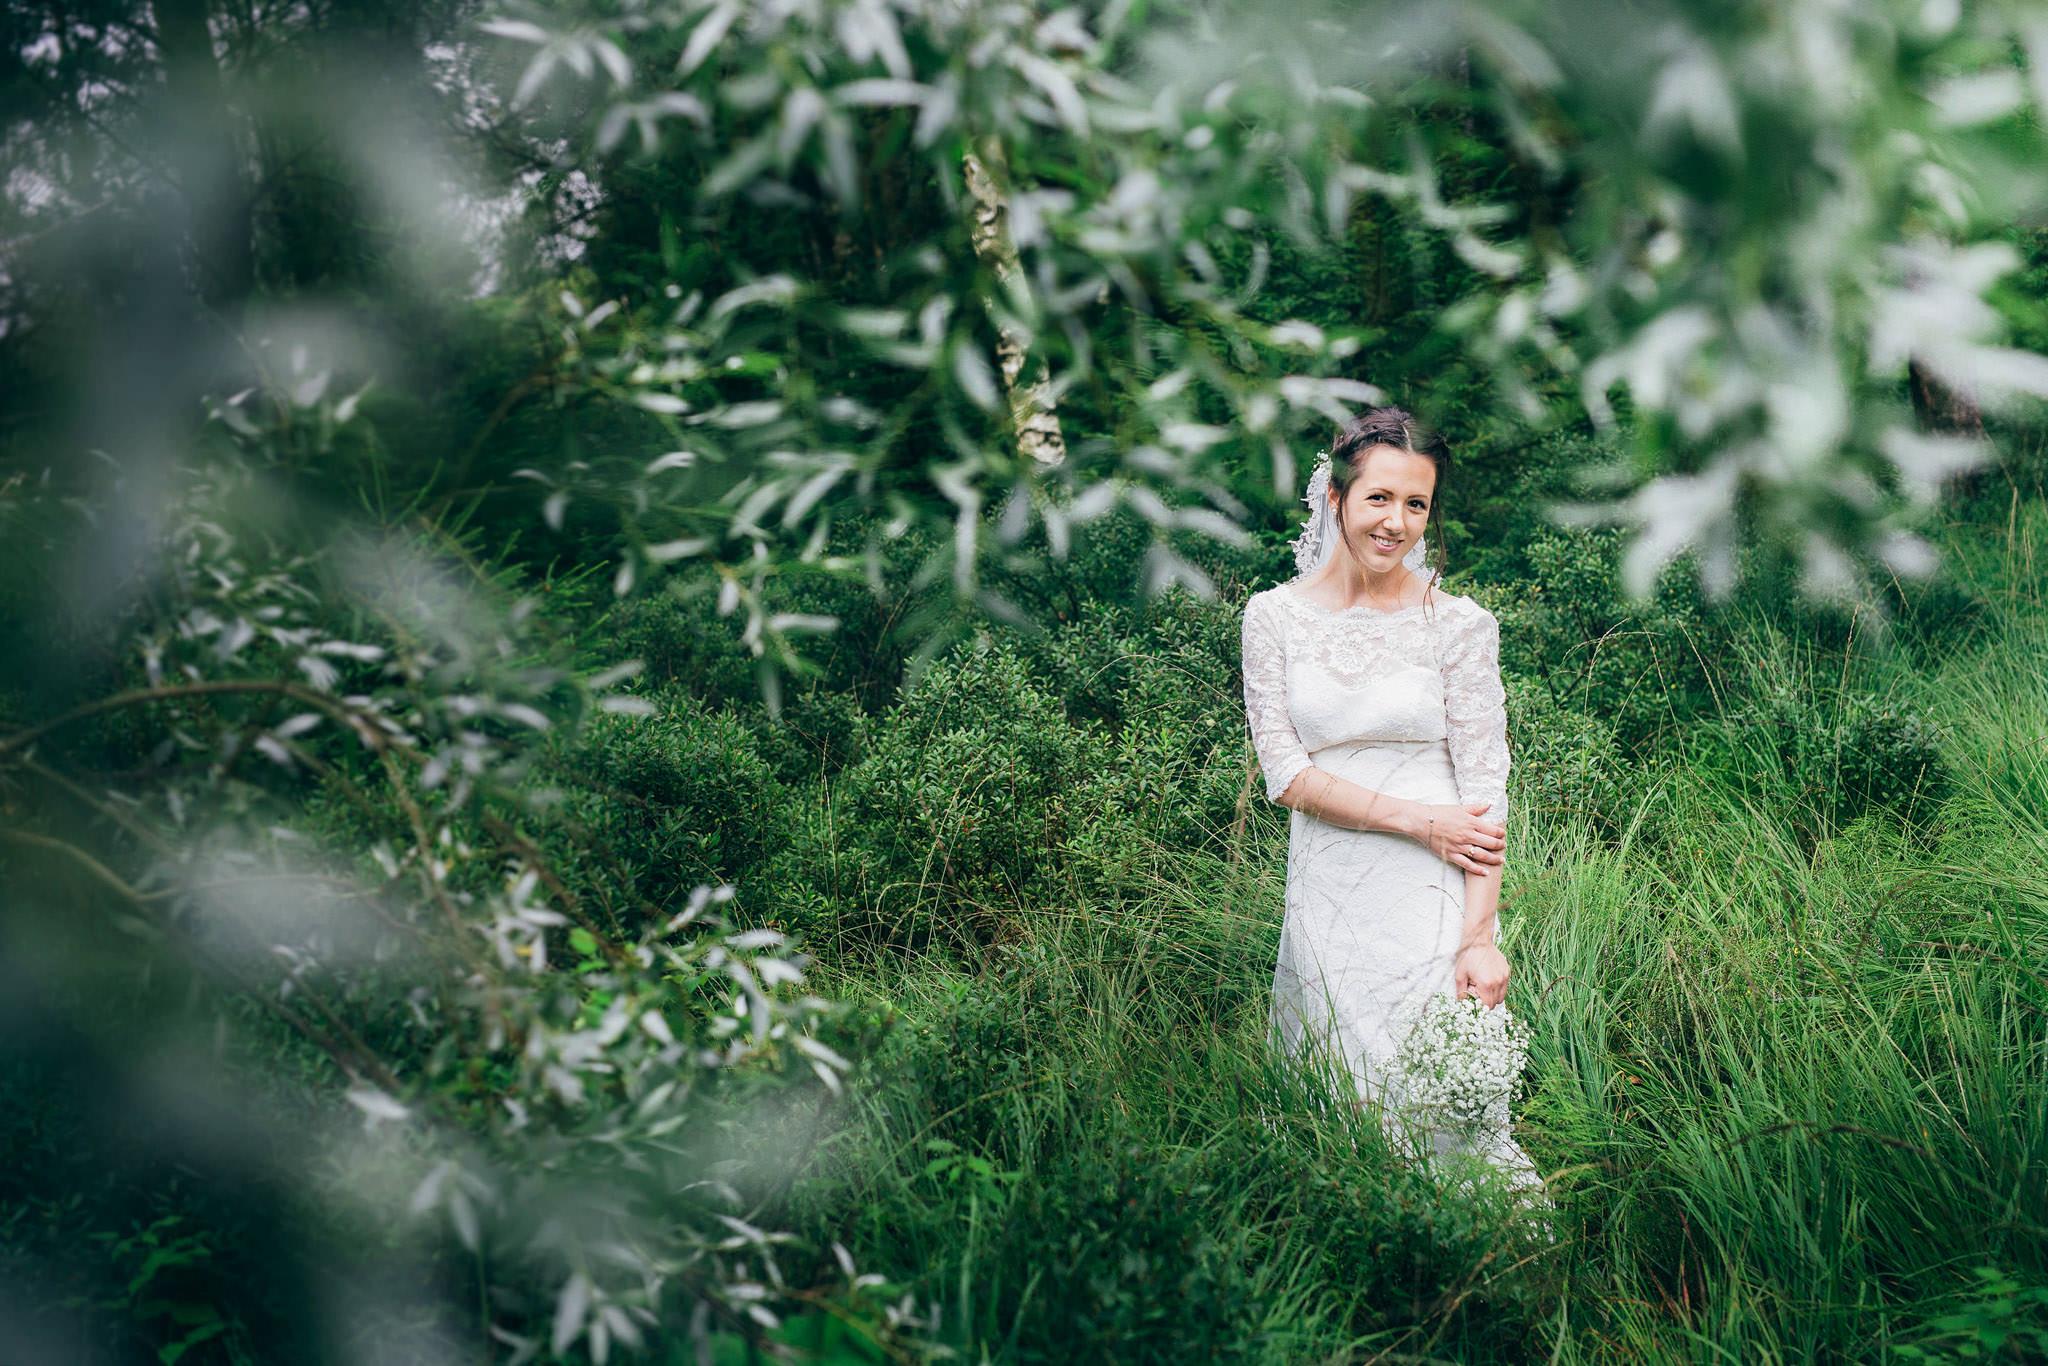 Norway+wedding+photographer+elopement+pre+wedding+Casey+Arneson-56.jpg